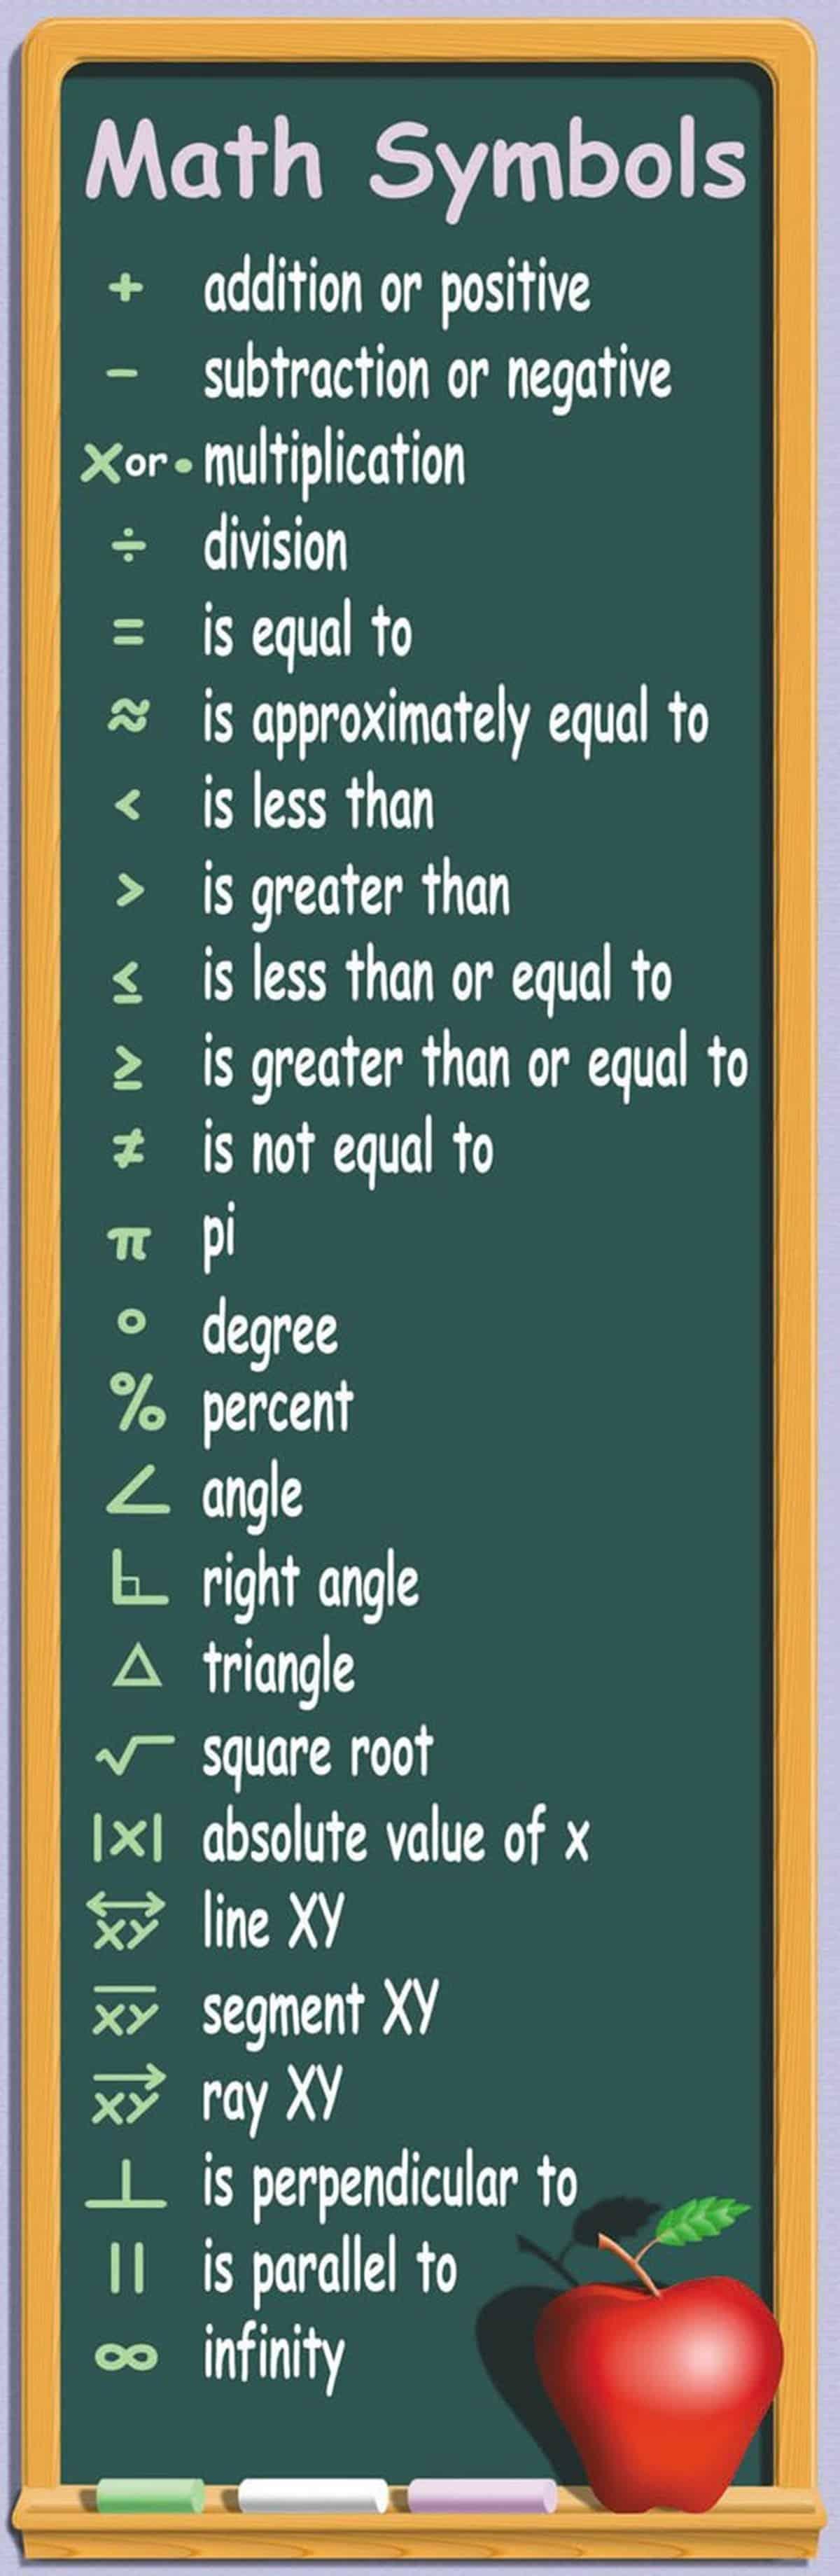 Math Symbols In English